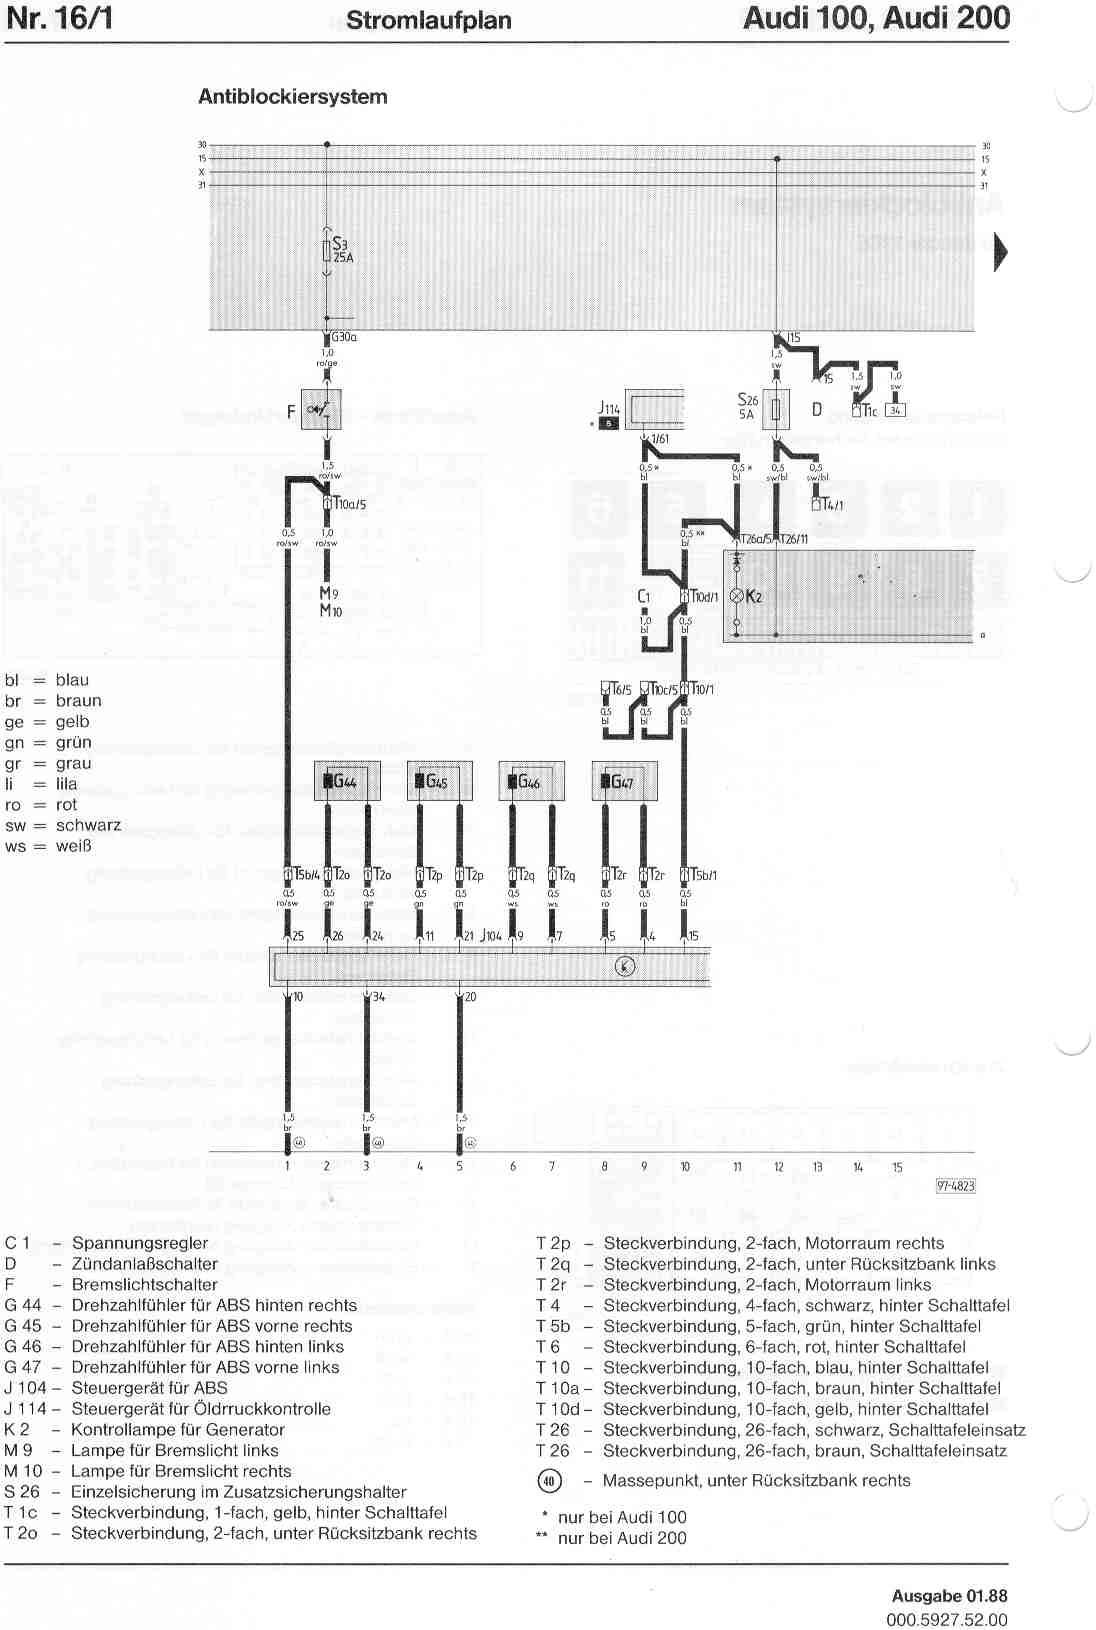 hight resolution of audi 200 wiring diagram schematics wiring diagrams u2022 rh seniorlivinguniversity co audi a4 schematic audi fuse box diagram